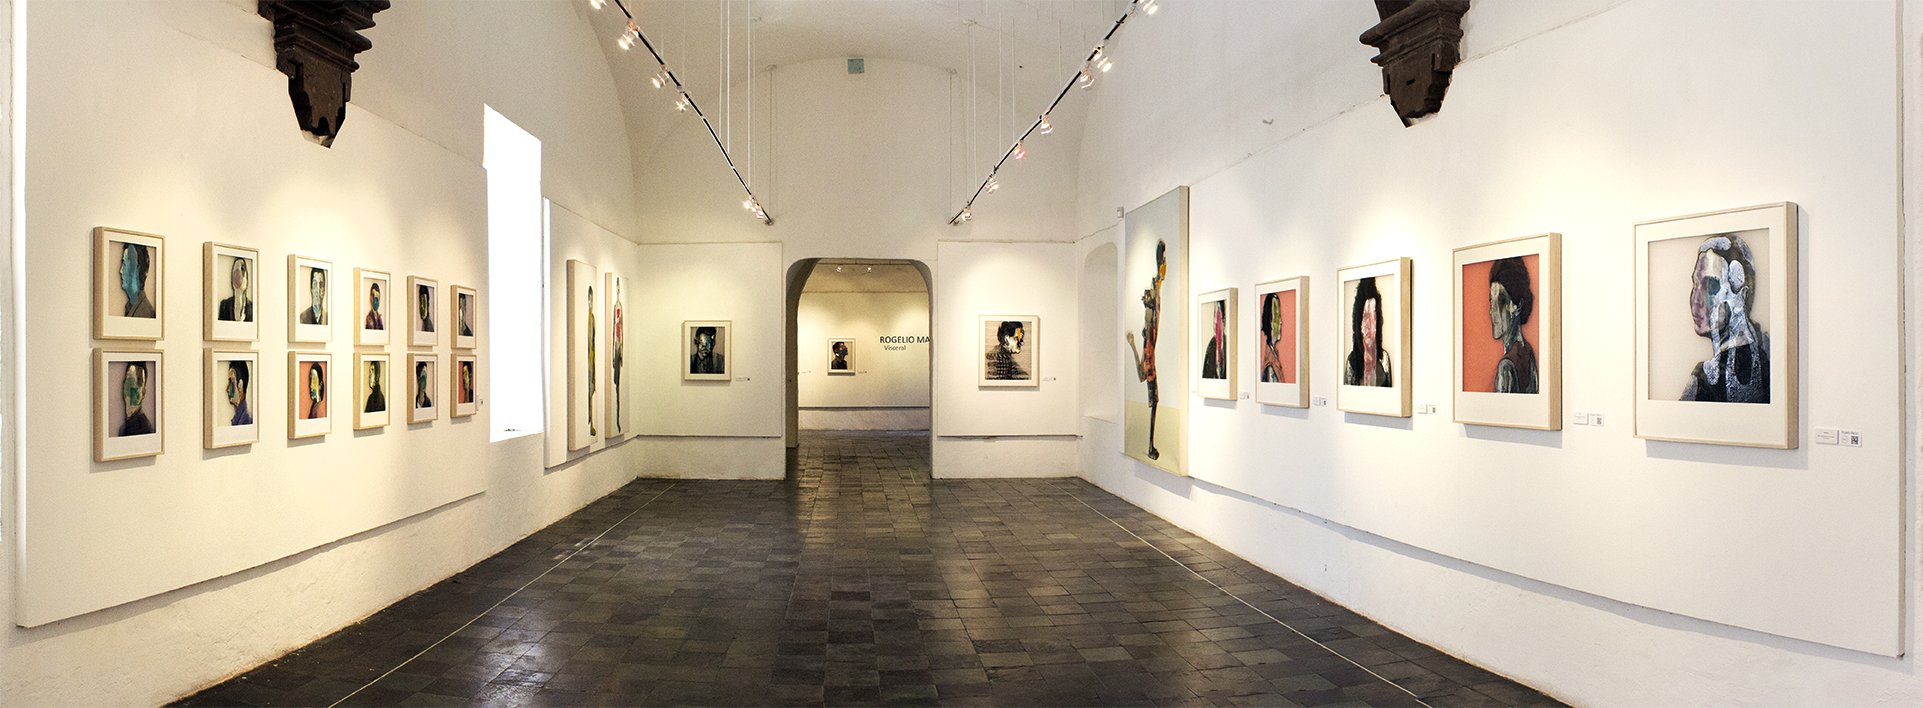 Exposición del artista Rogelio Manzo